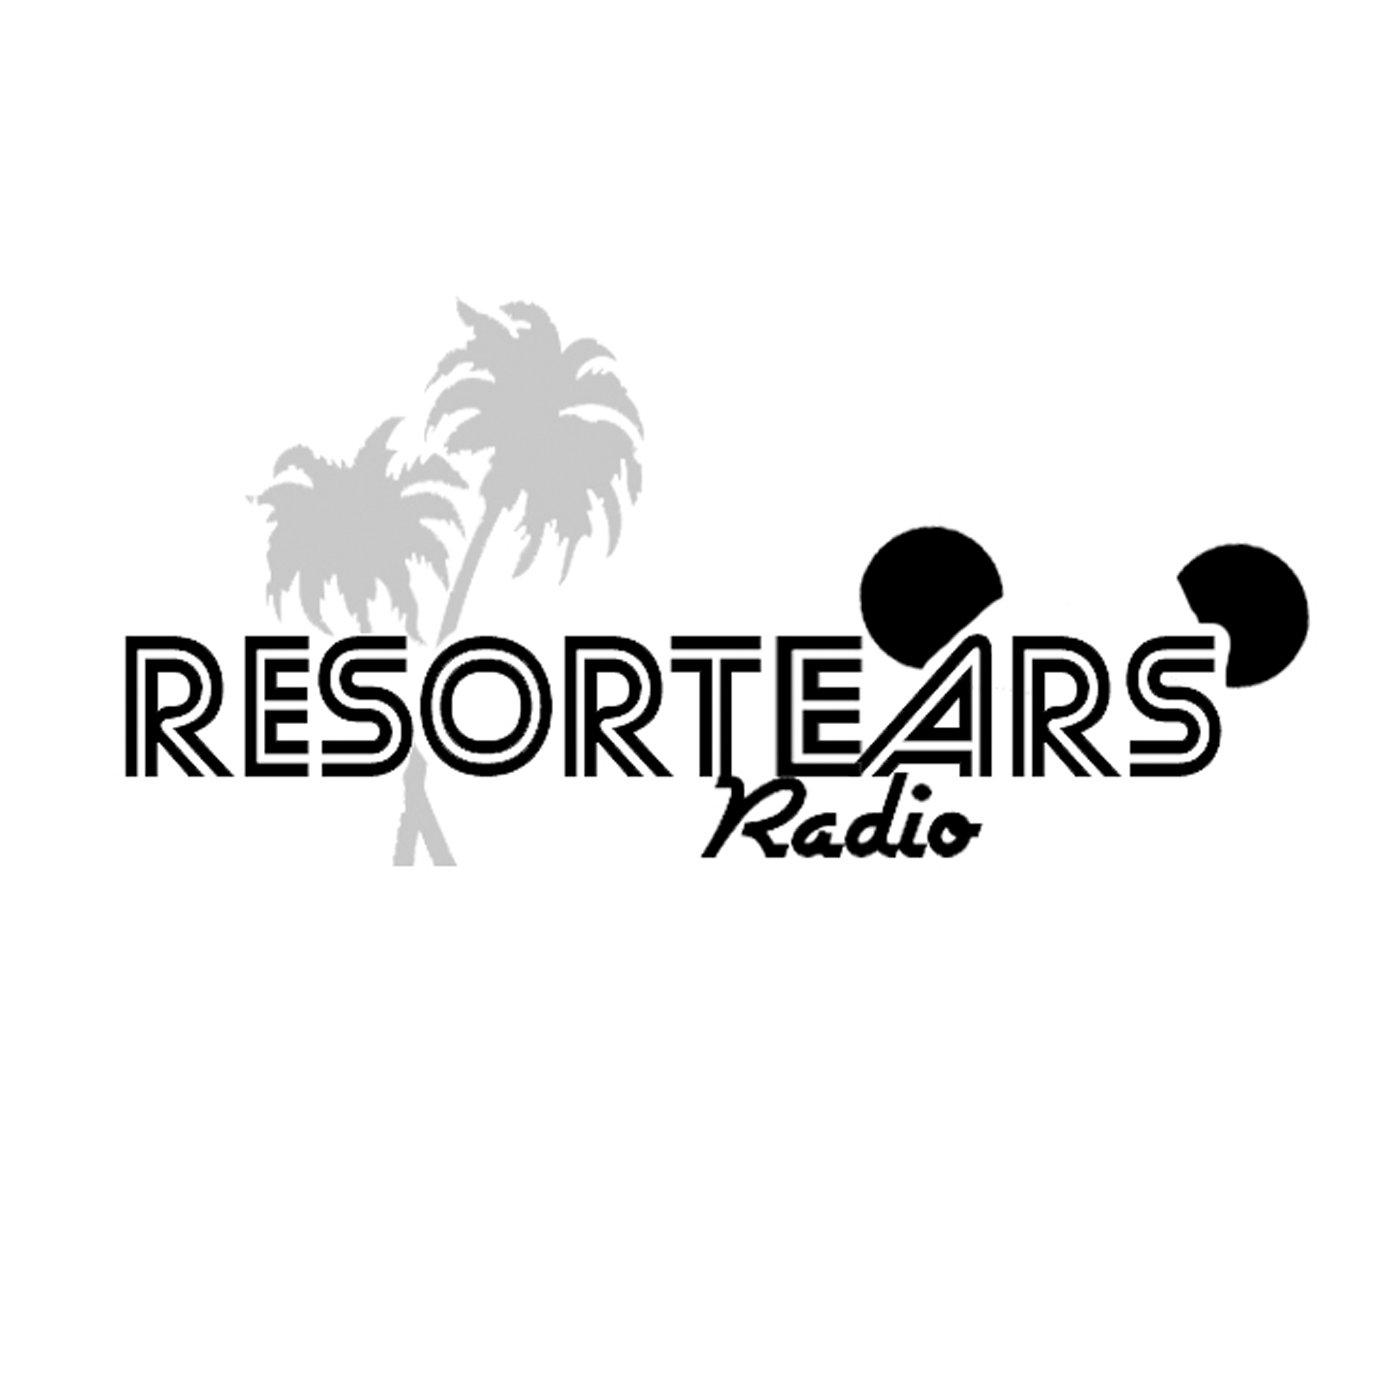 Resort Ears Radio